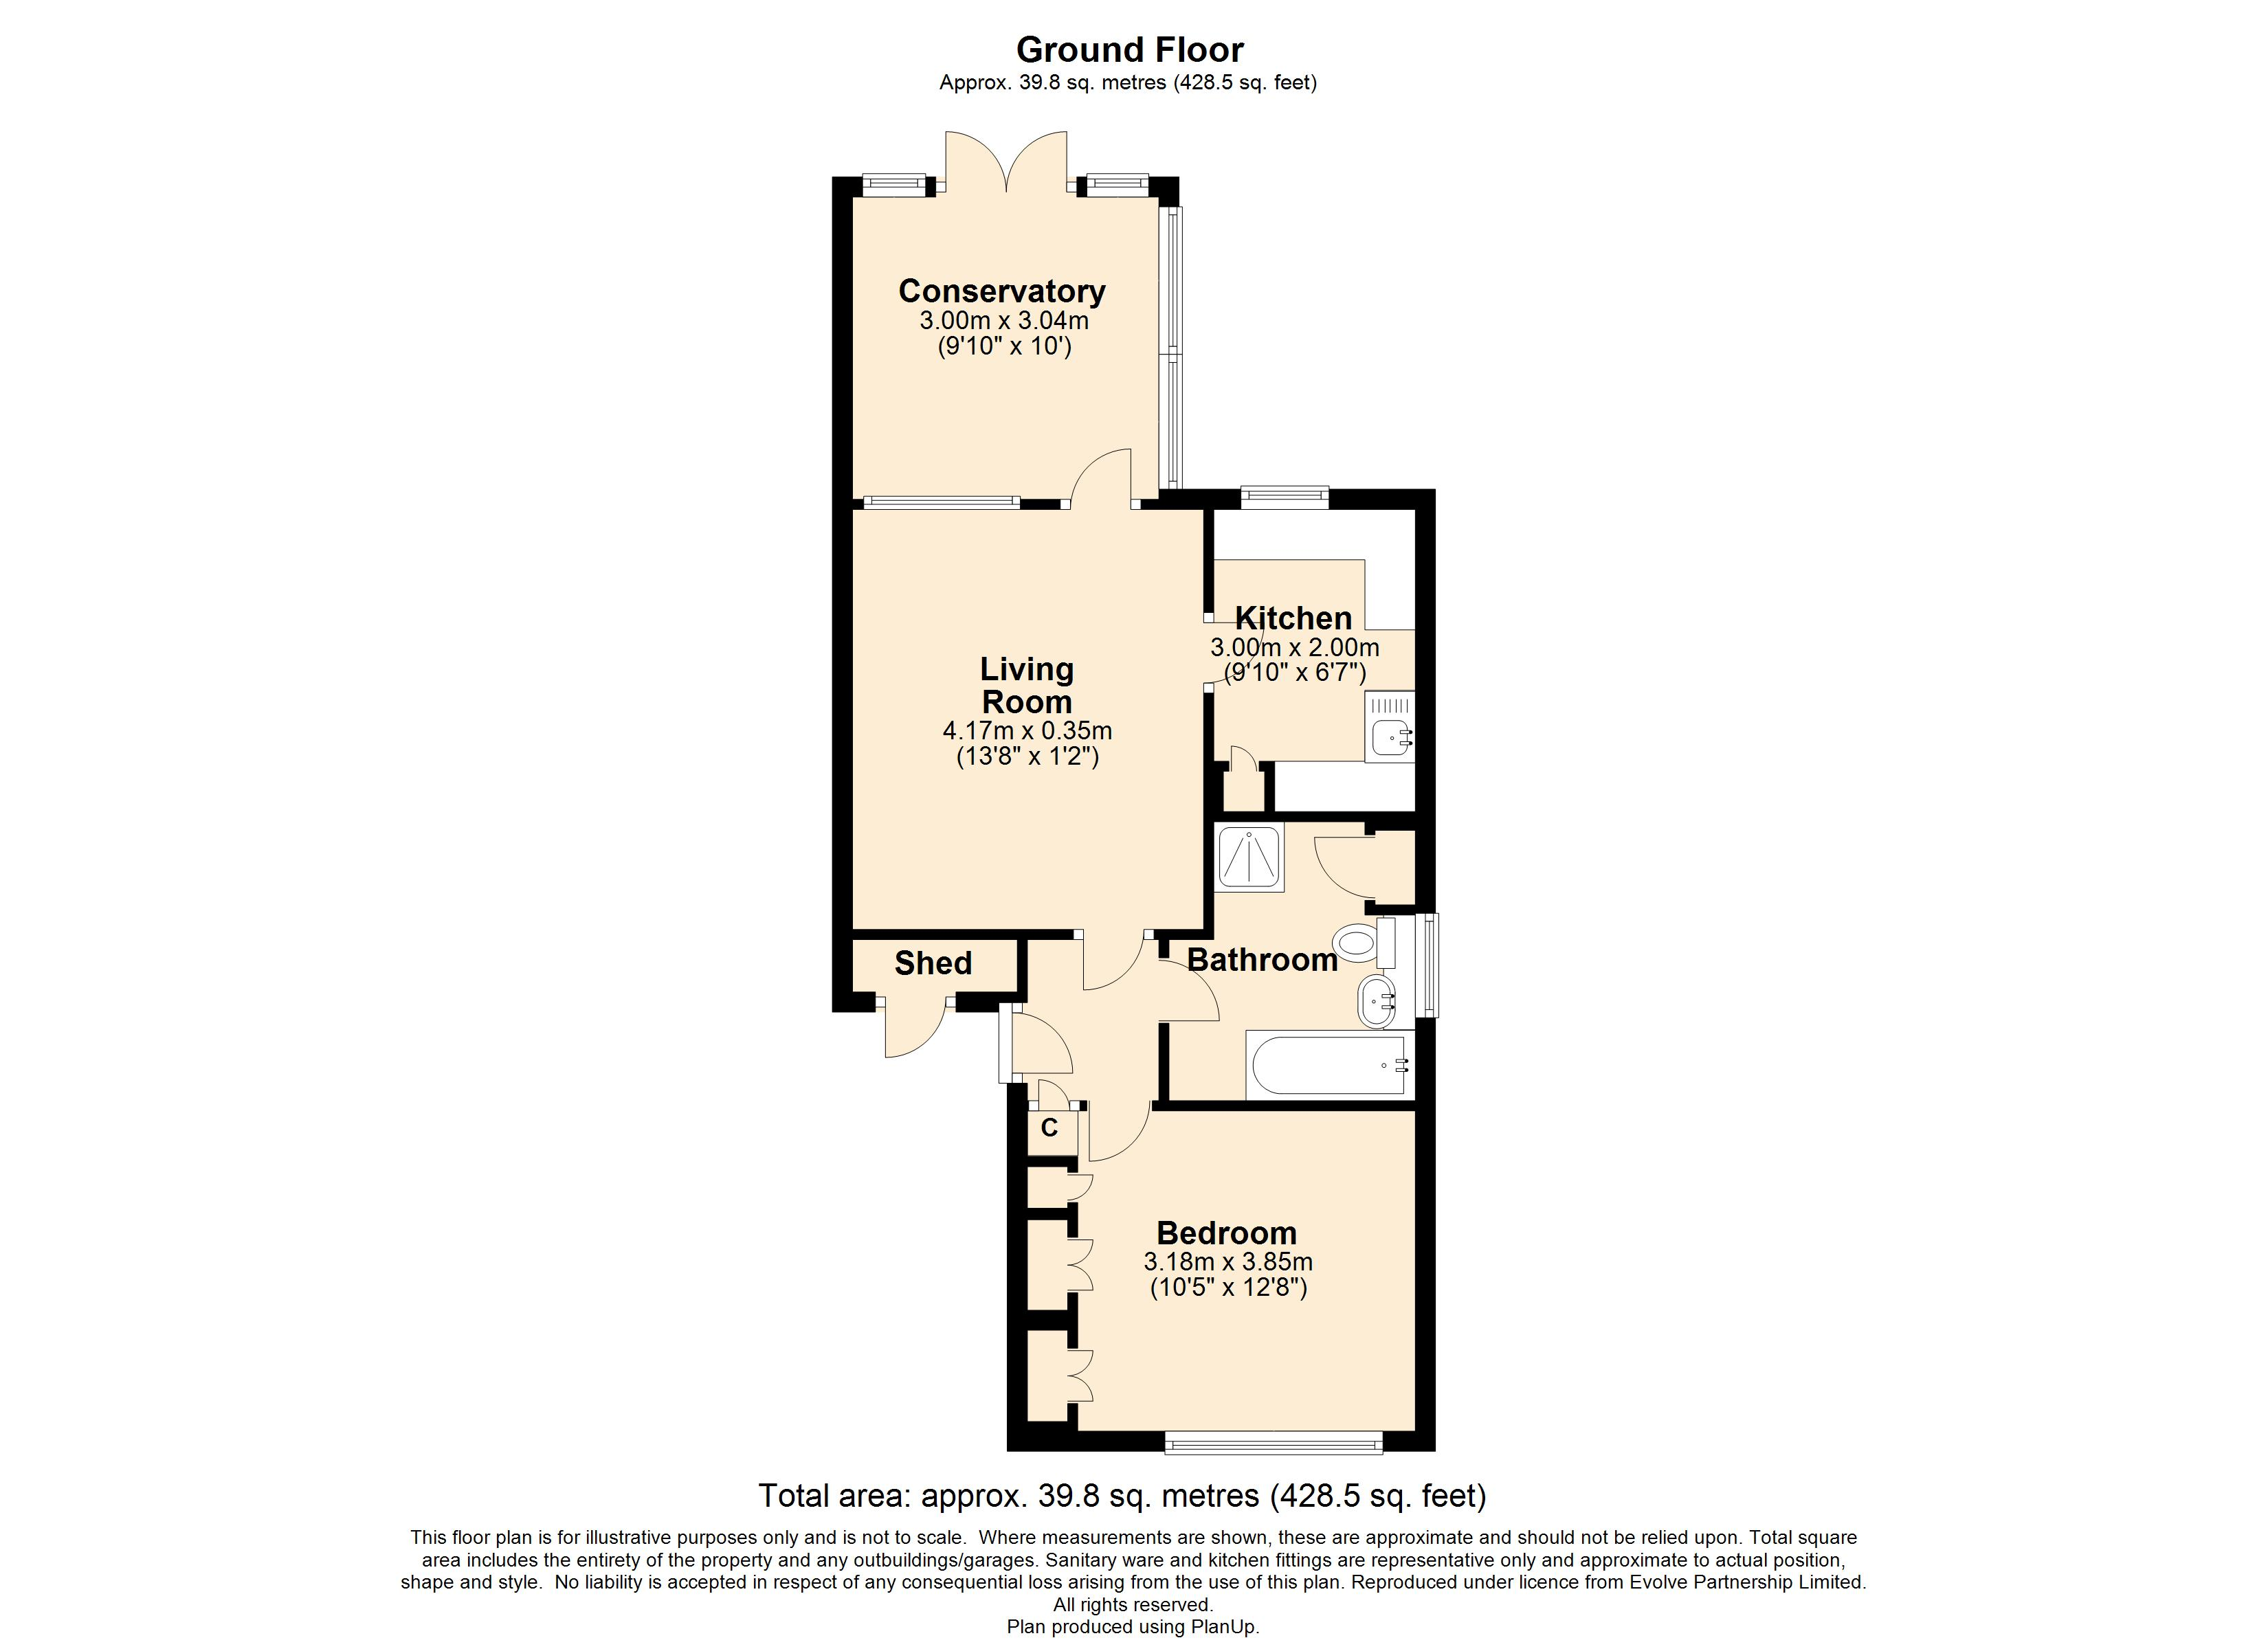 18 Jackson Close Floorplan